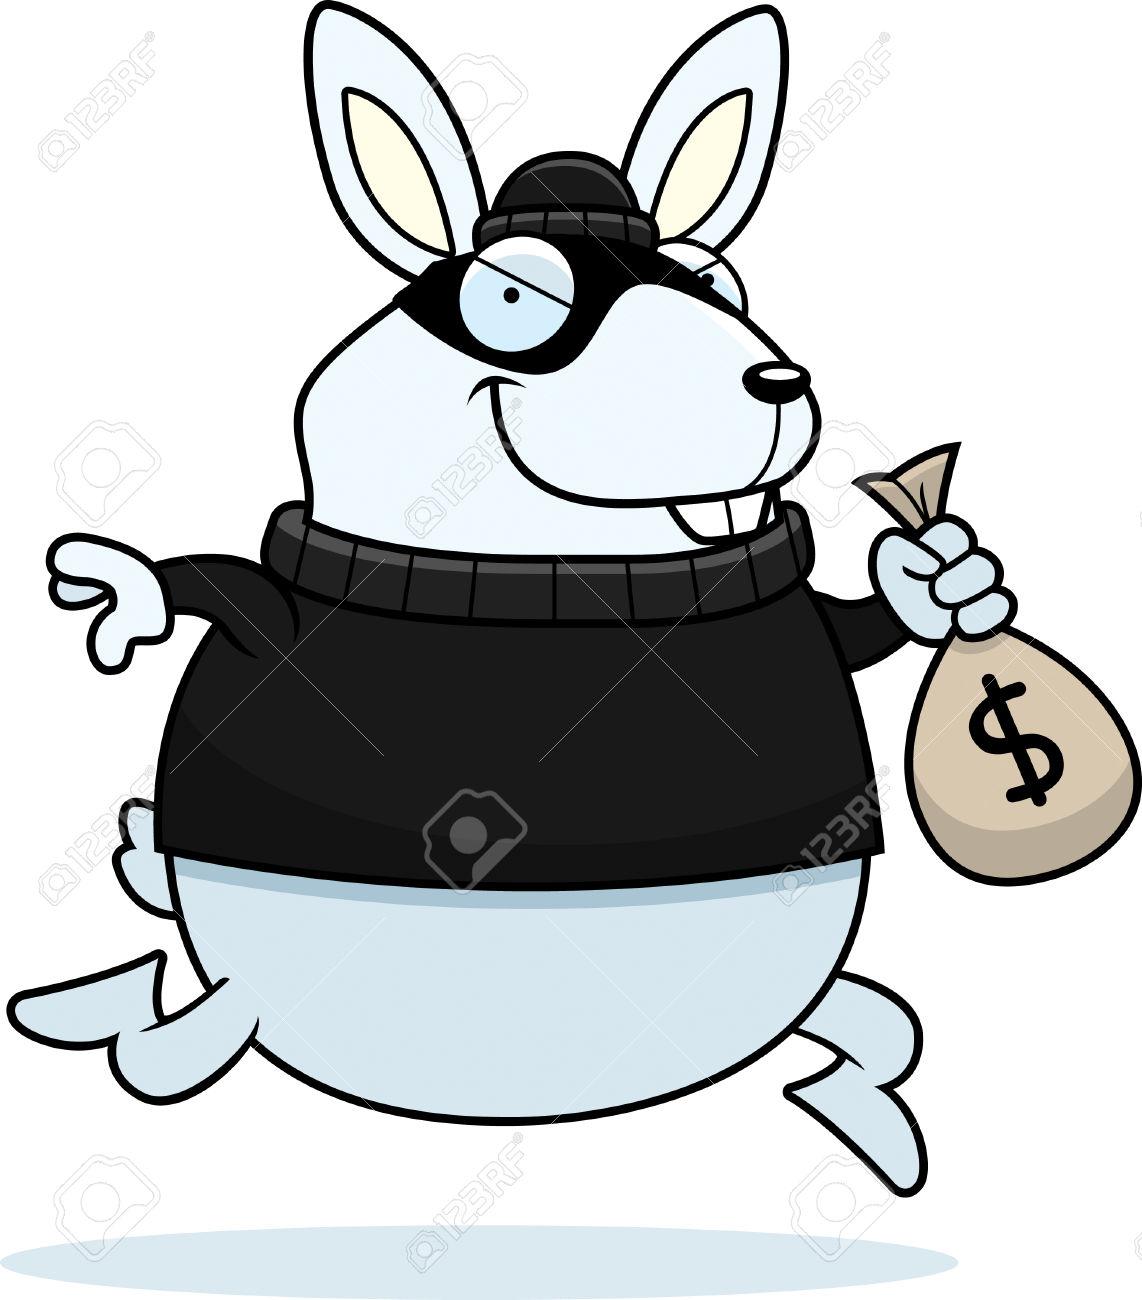 A Cartoon Illustration Of A Rabbit Burglar Stealing Money. Royalty.